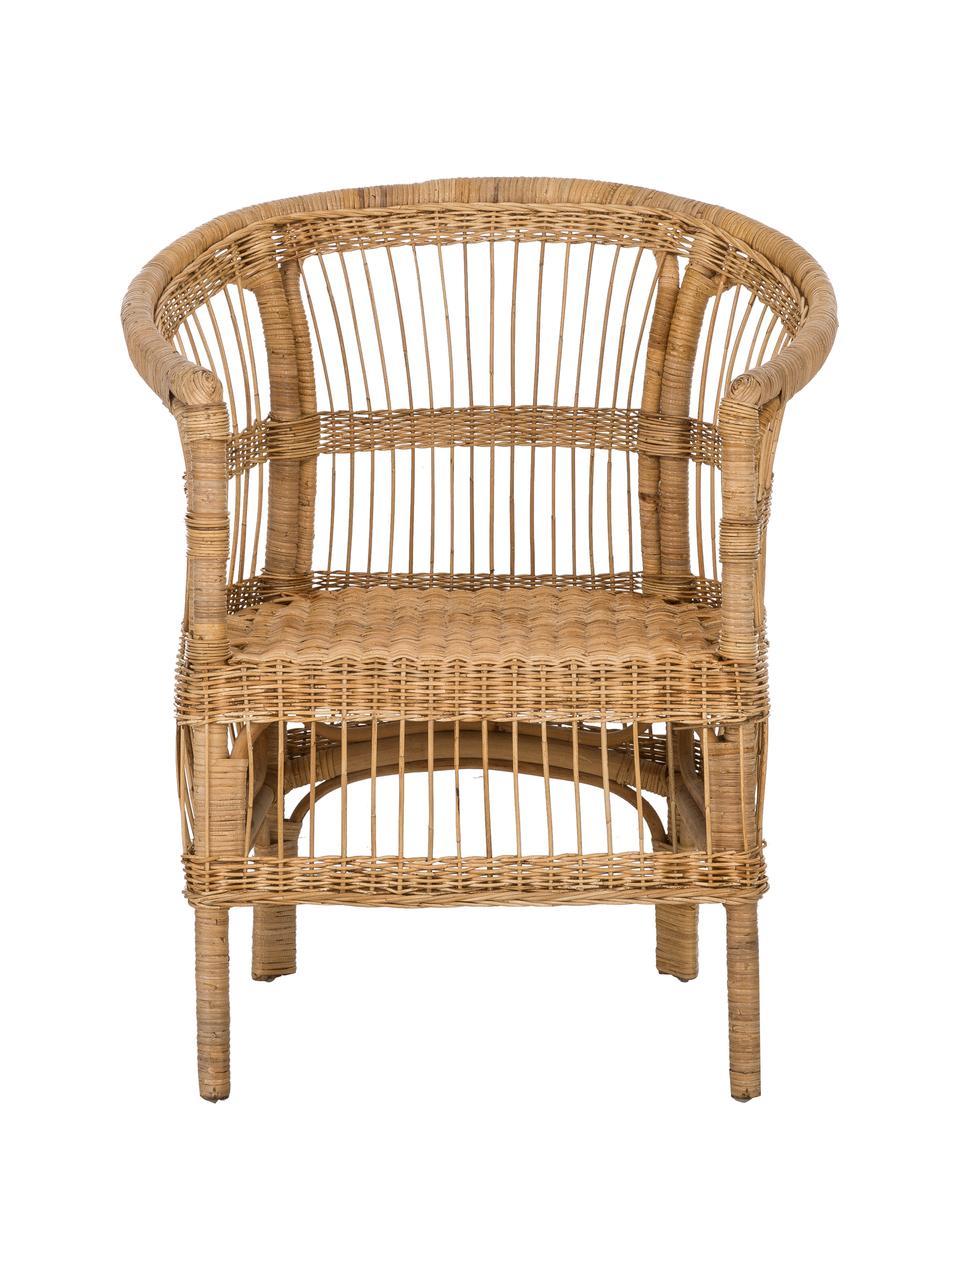 Sedia con braccioli in rattan  Palma, Rattan, Rattan, Larg. 60 x Prof. 70 cm